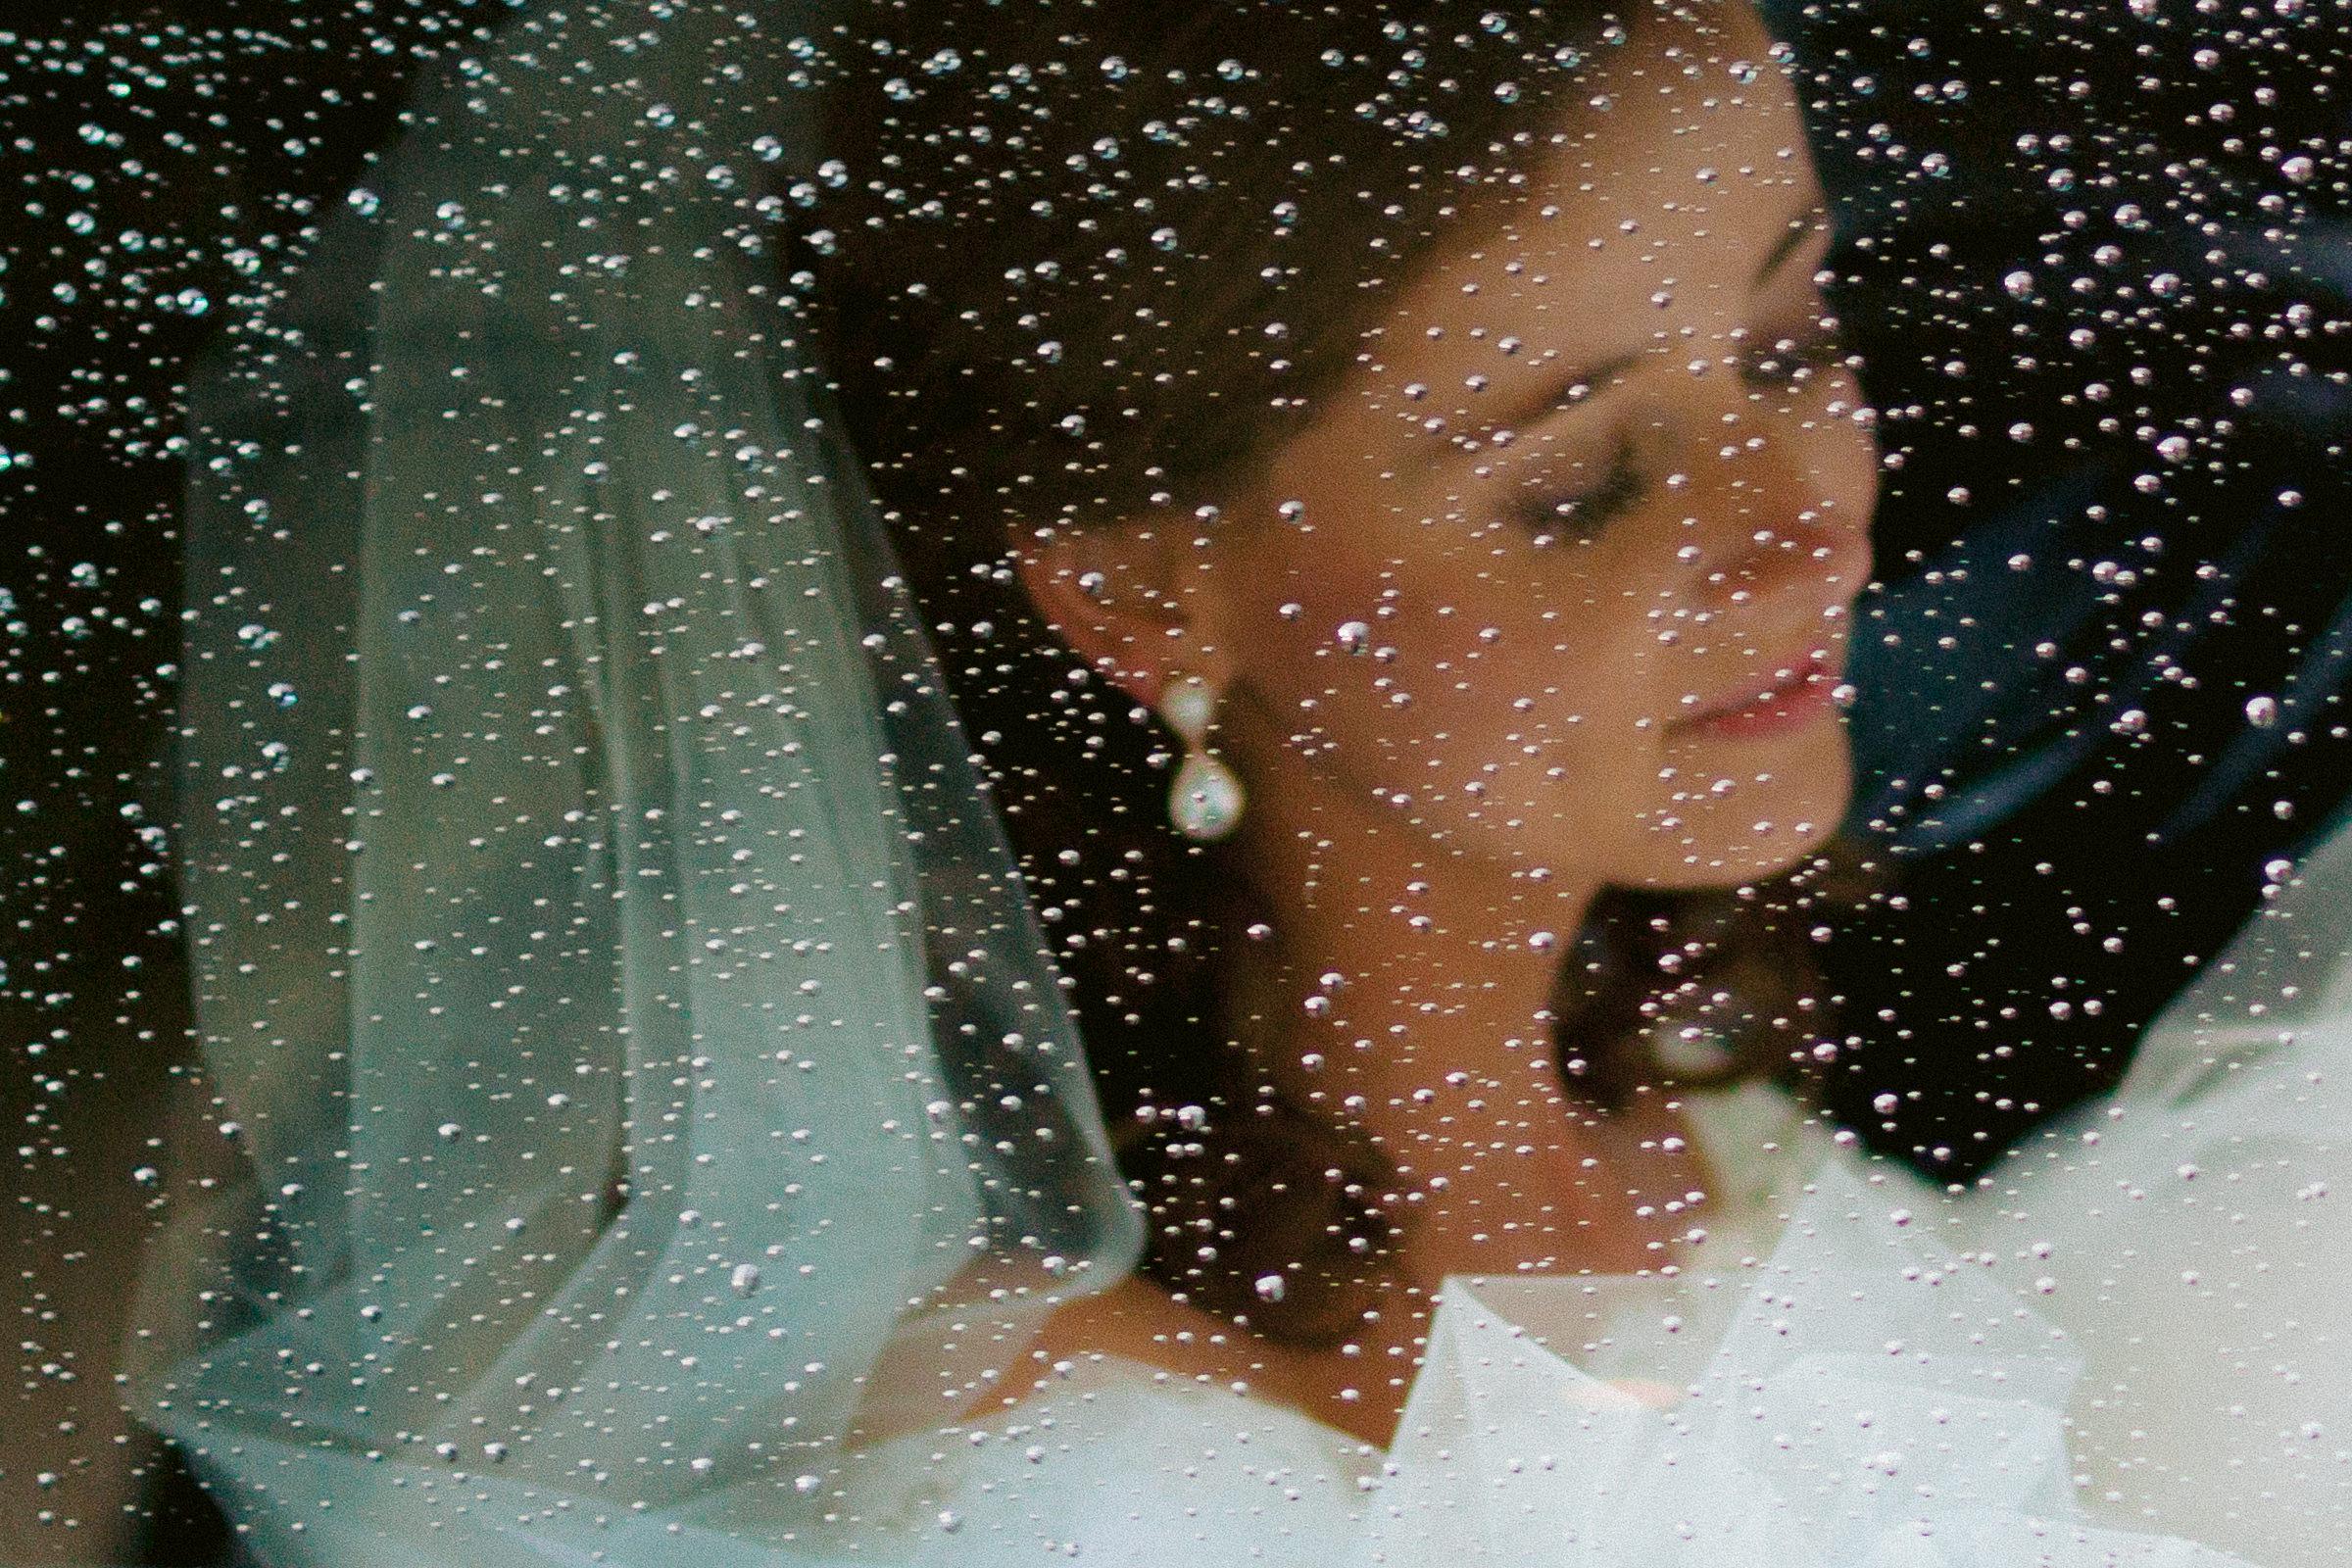 Bride through car window with raindrops - photo by Peter van der Lingen Wedding Photography